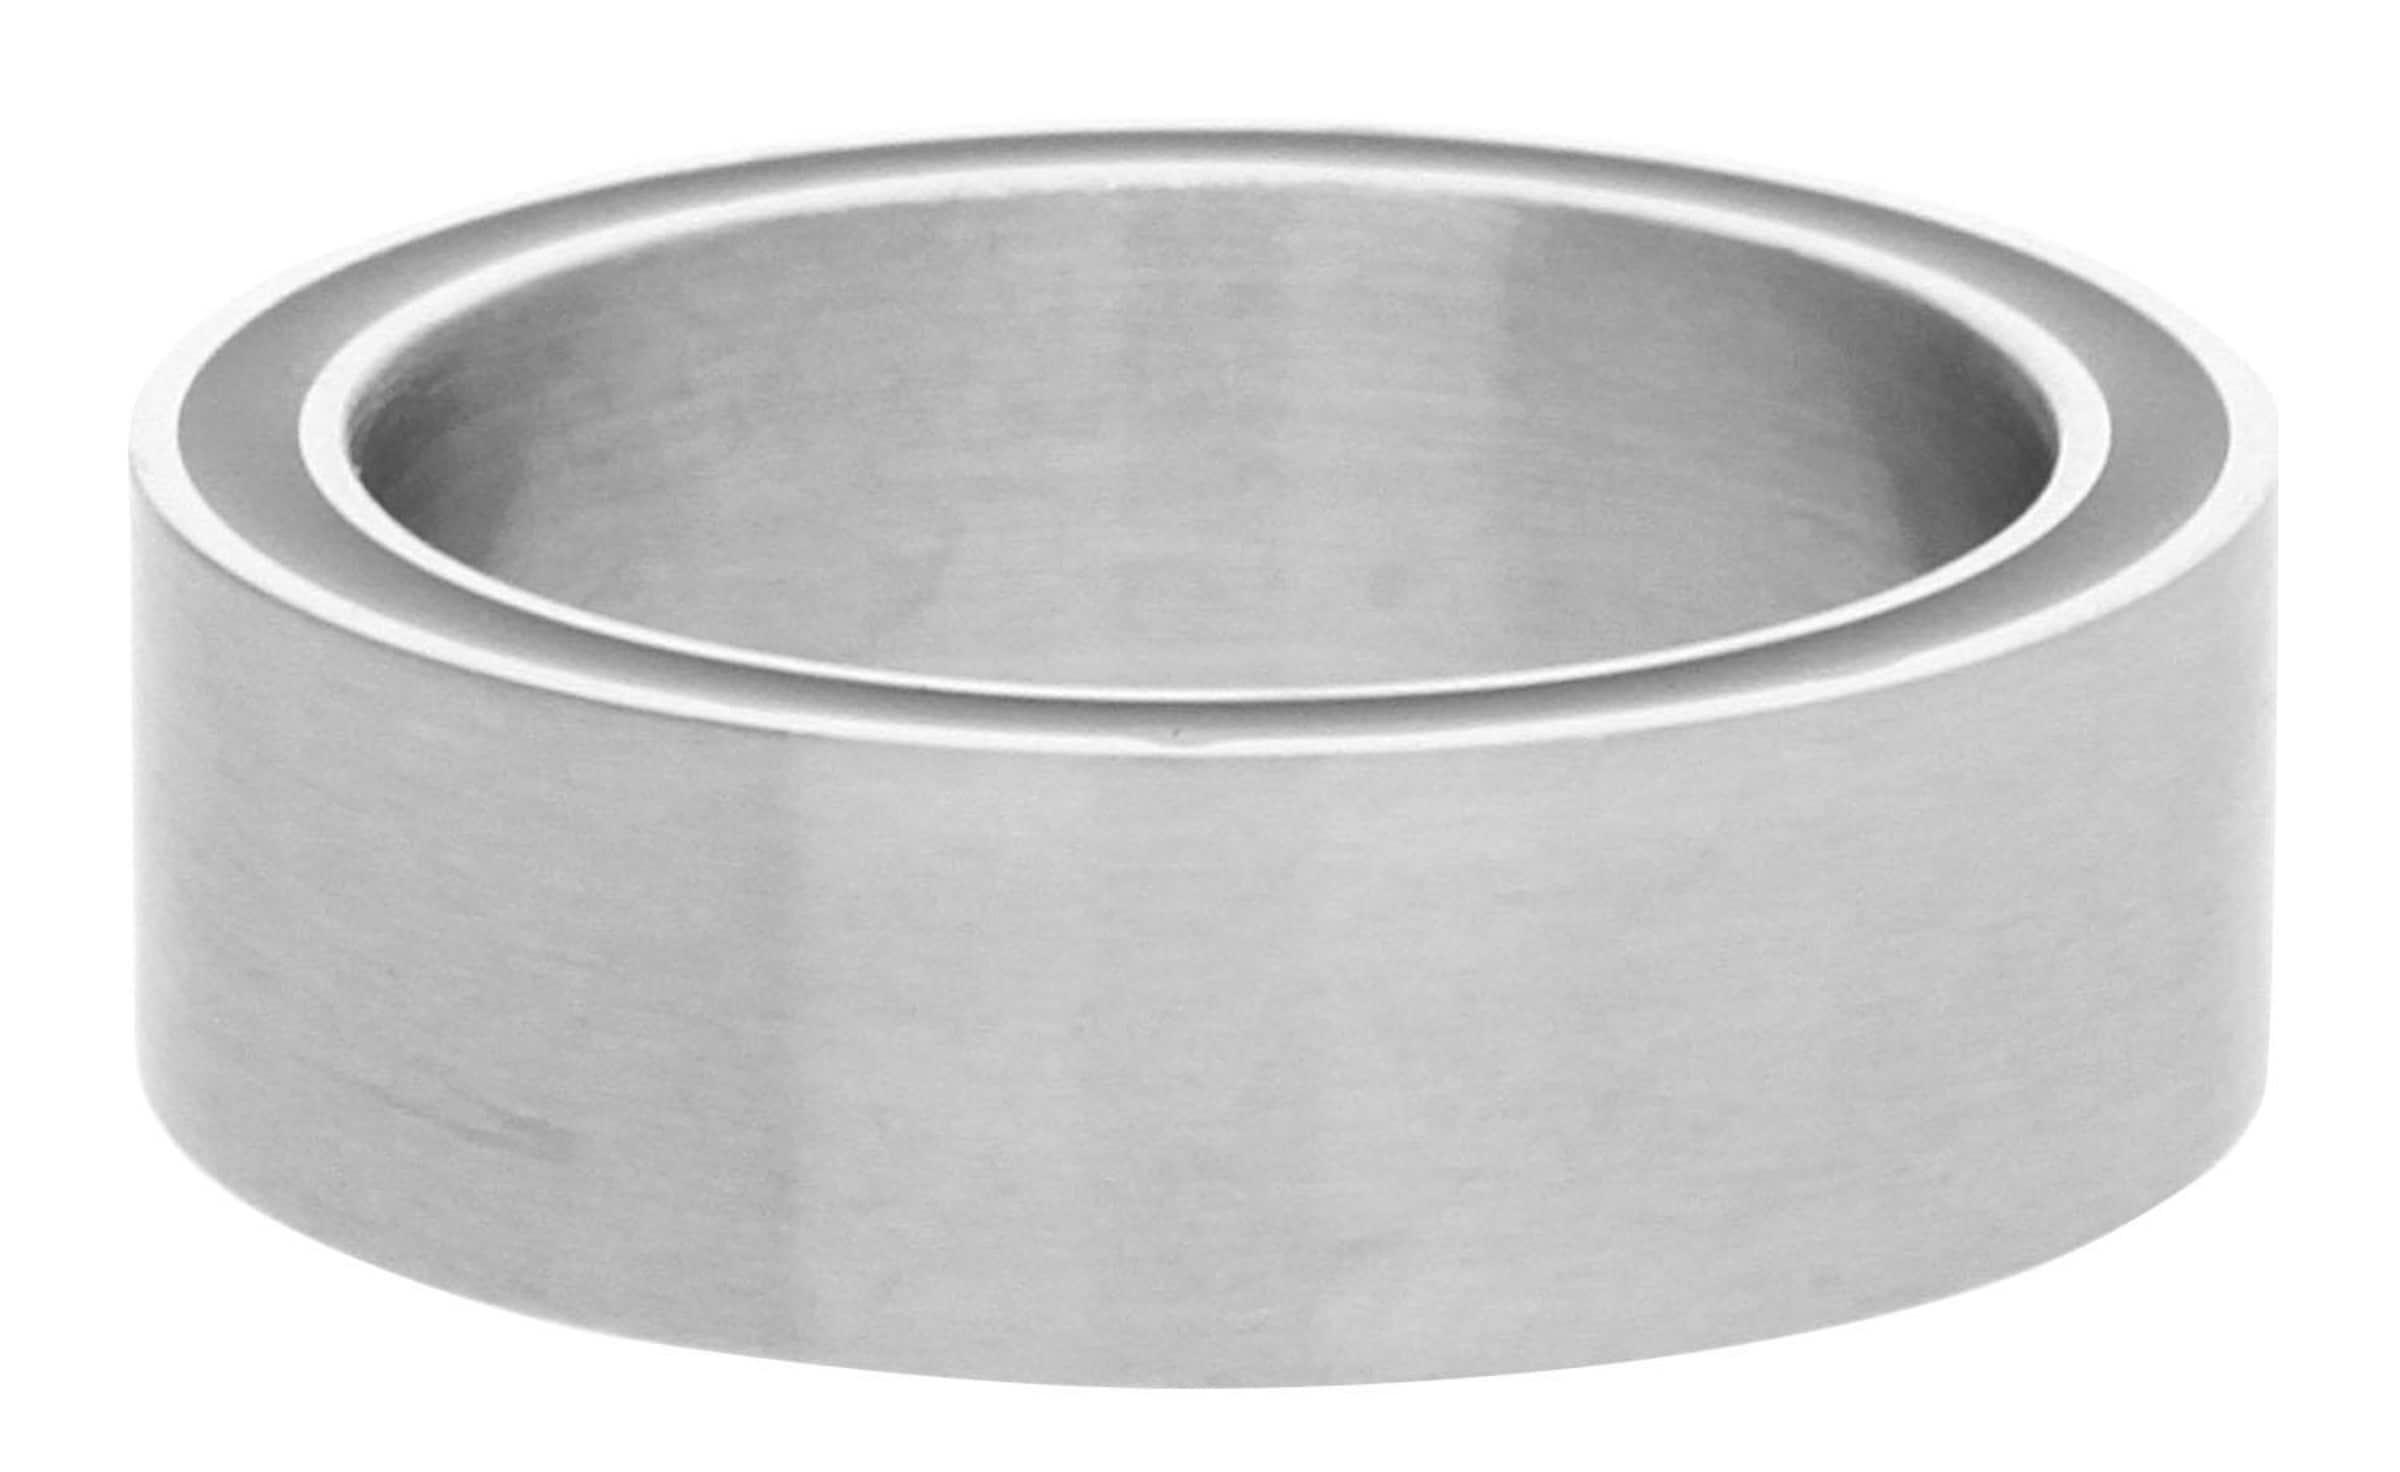 In In In In JoopFingerring JoopFingerring JoopFingerring JoopFingerring Silber Silber Silber mNnwOv80